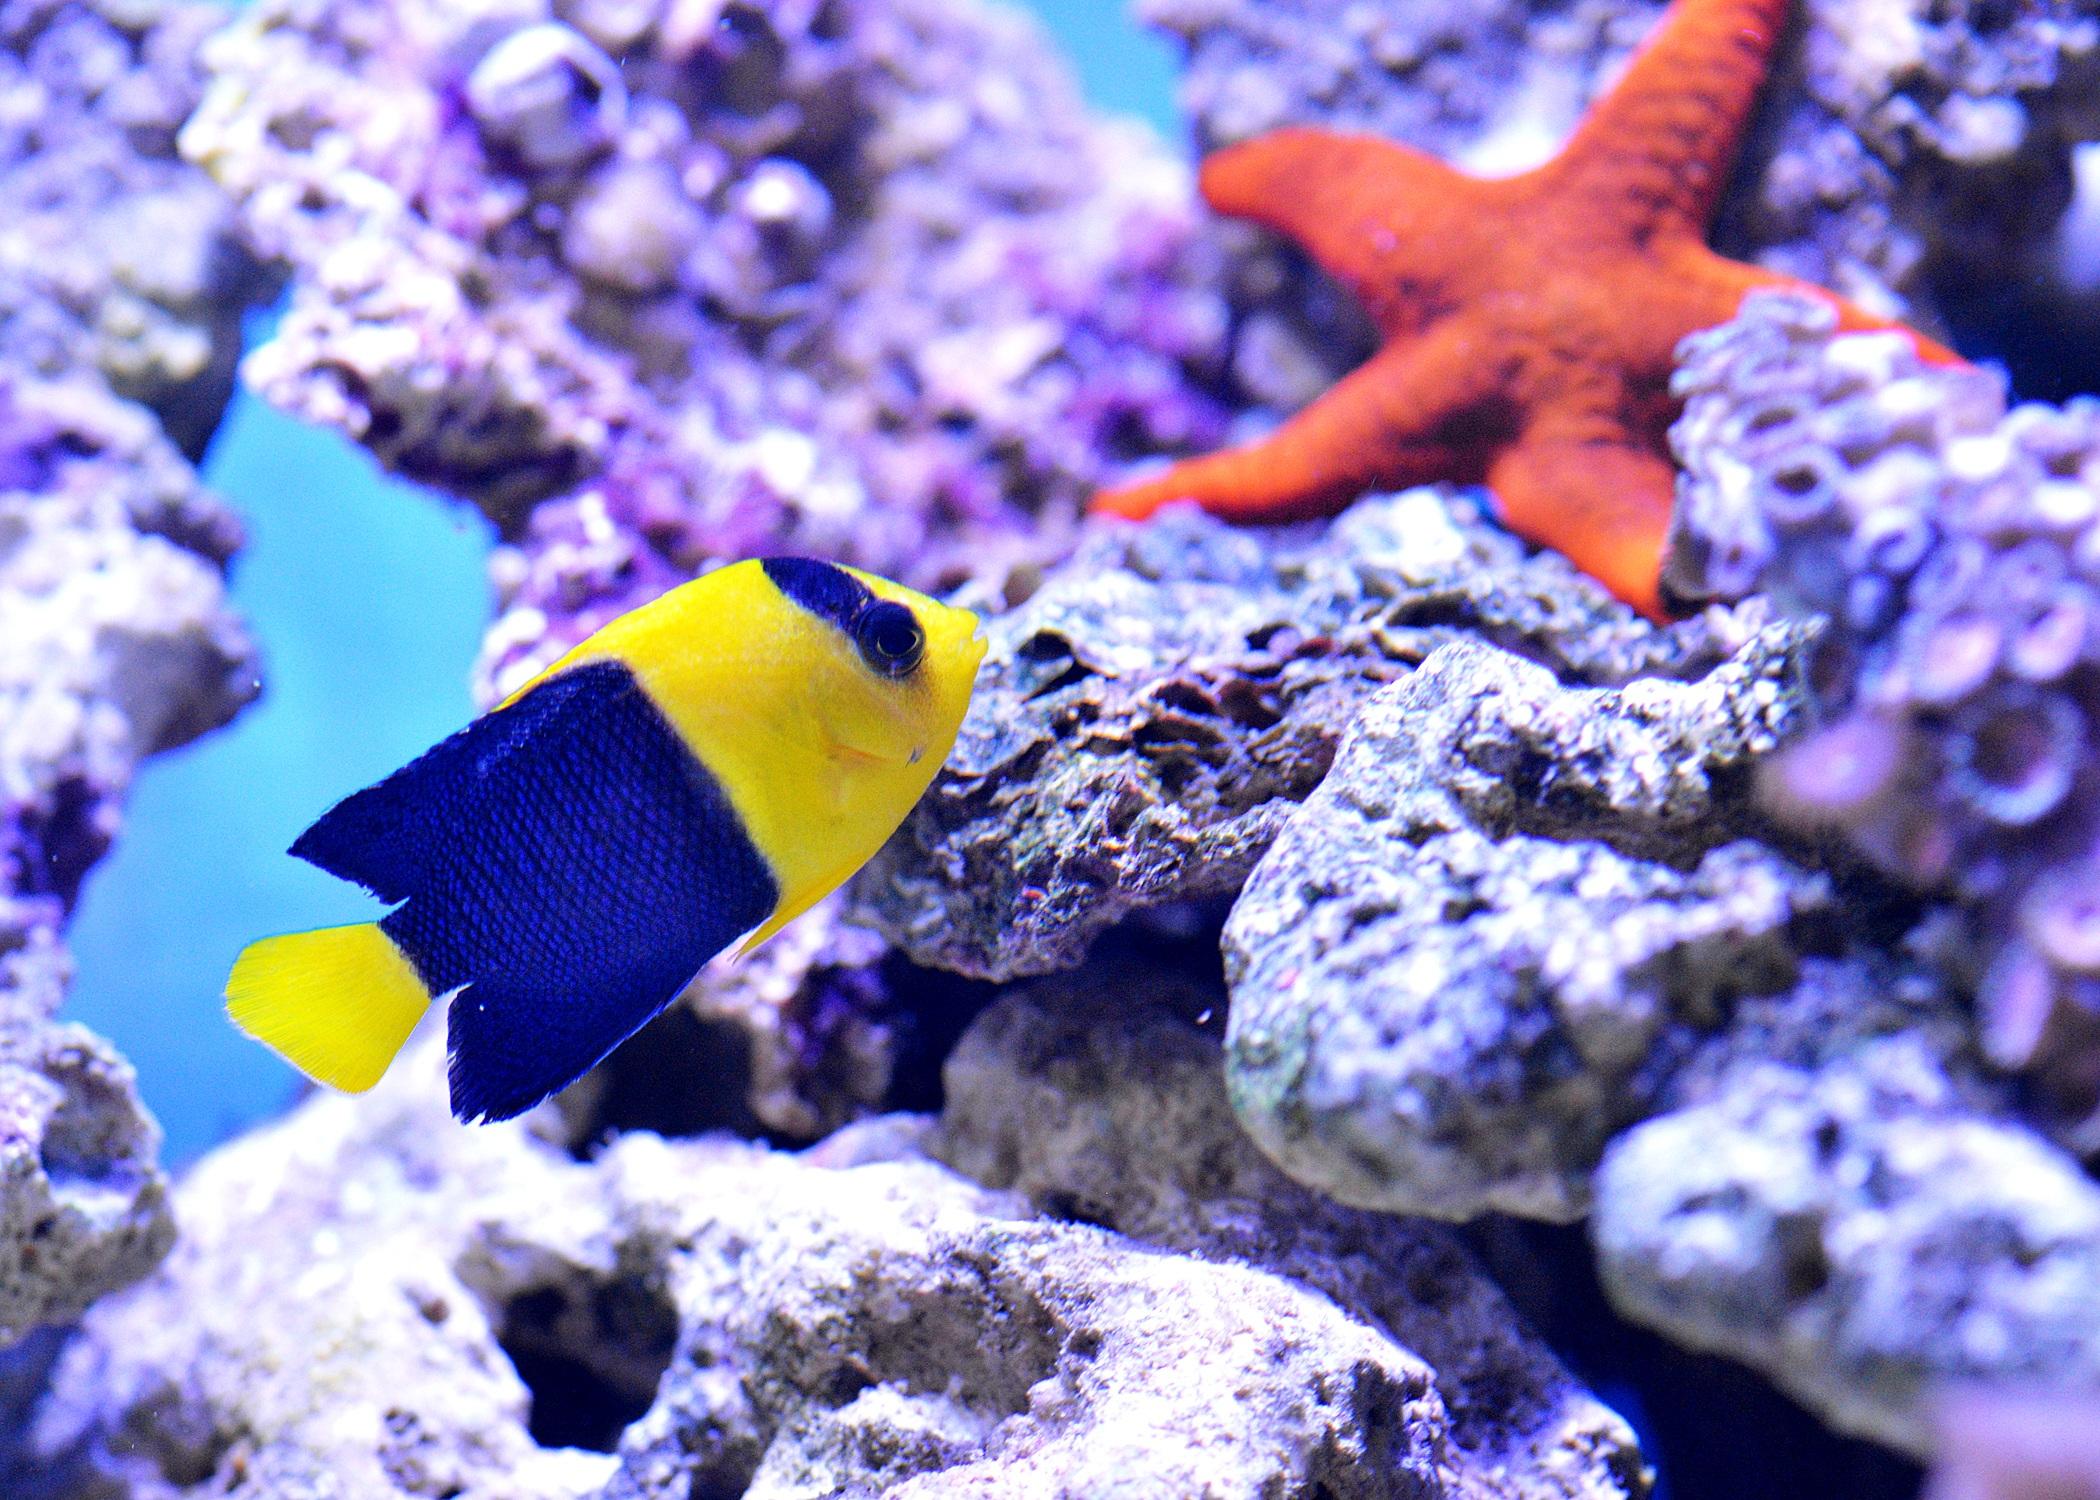 8a3e70cf12e3 sea star underwater biology blue fish fauna starfish coral coral reef  invertebrate reef nemo aquarium macro